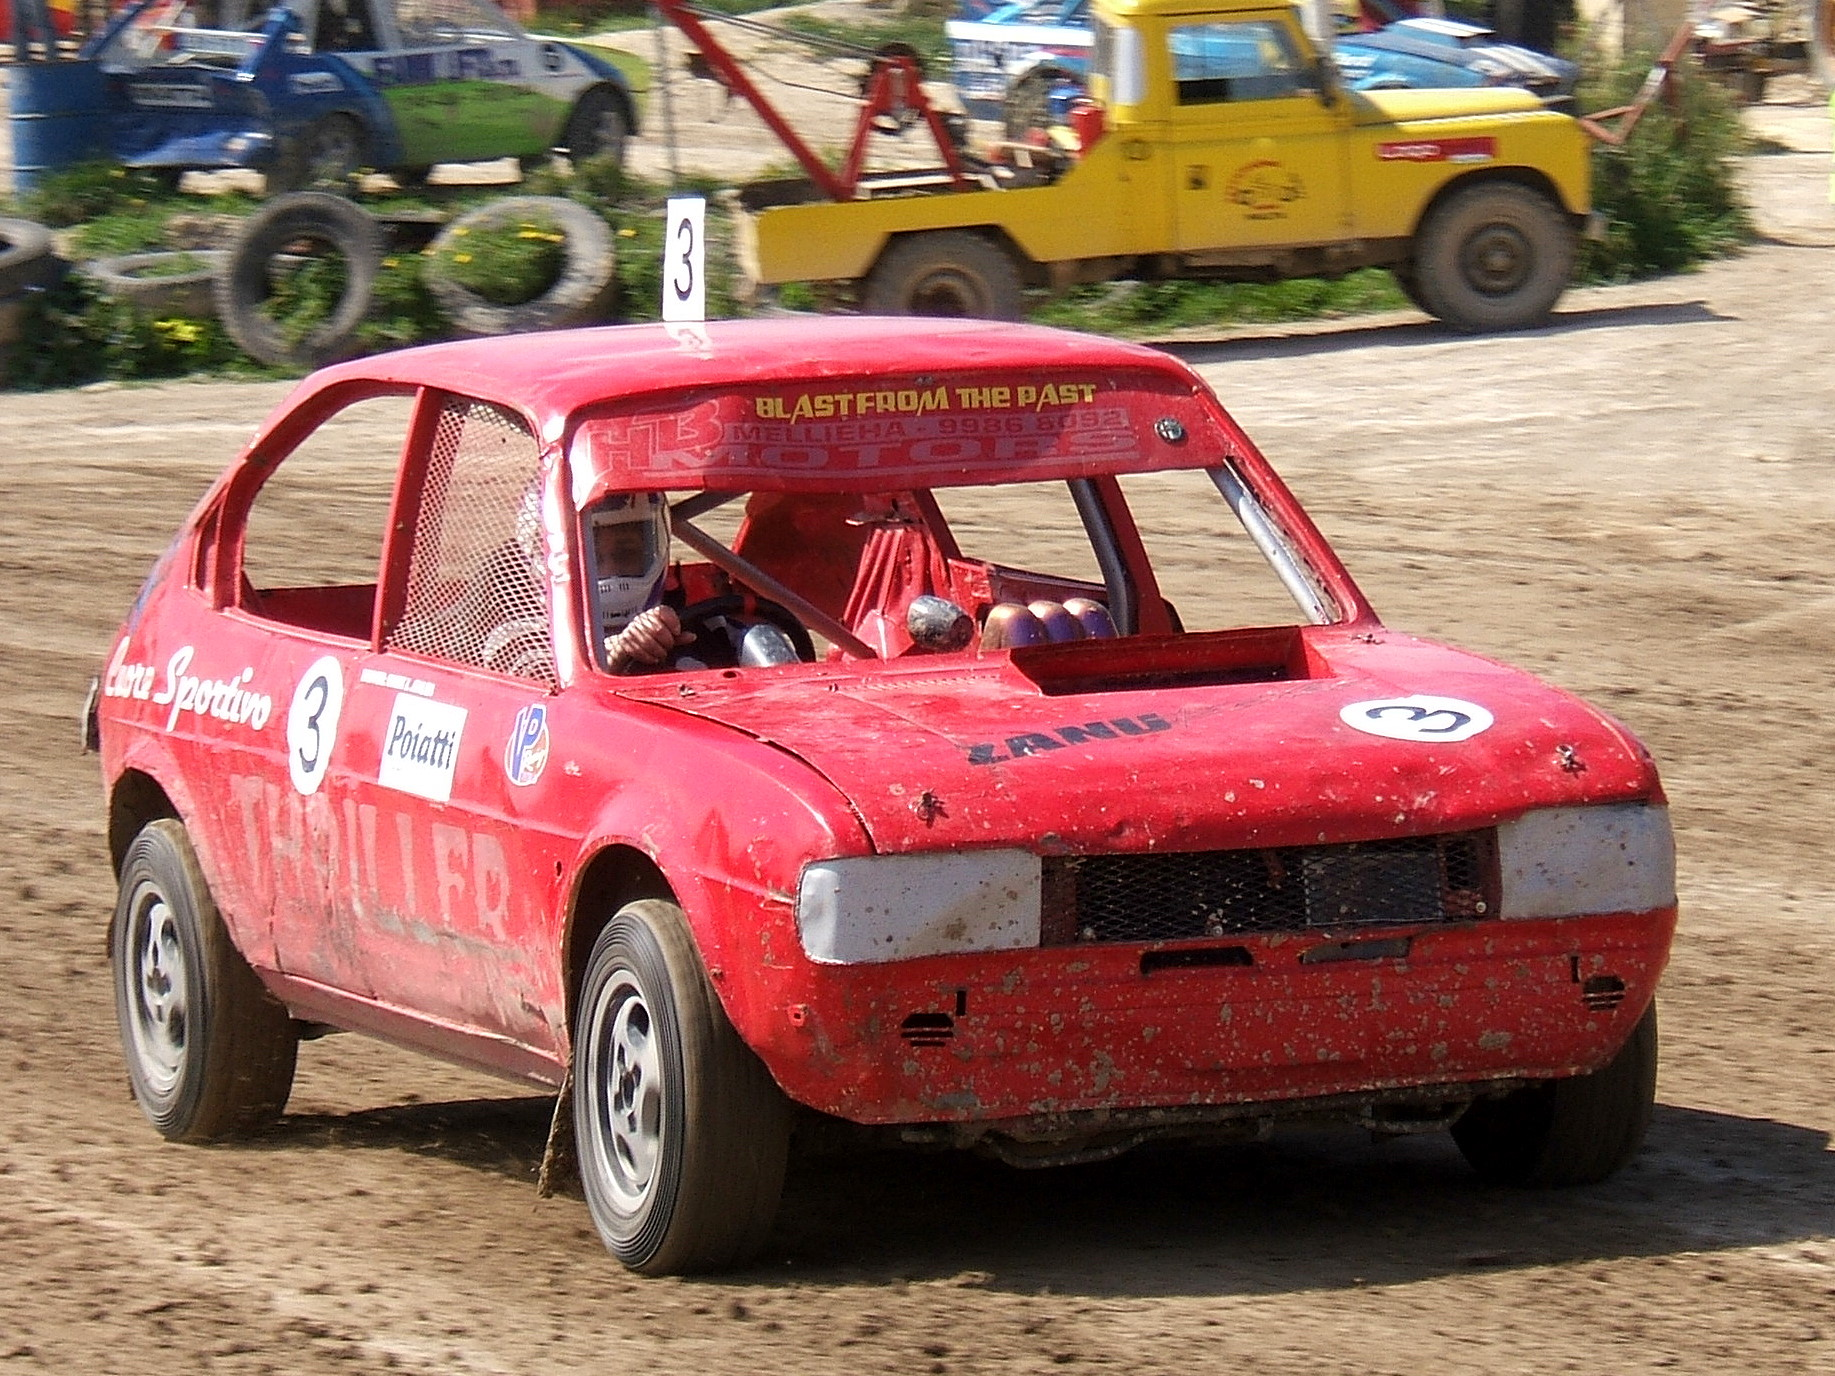 Mark Galea - Autocross A Champion 2009